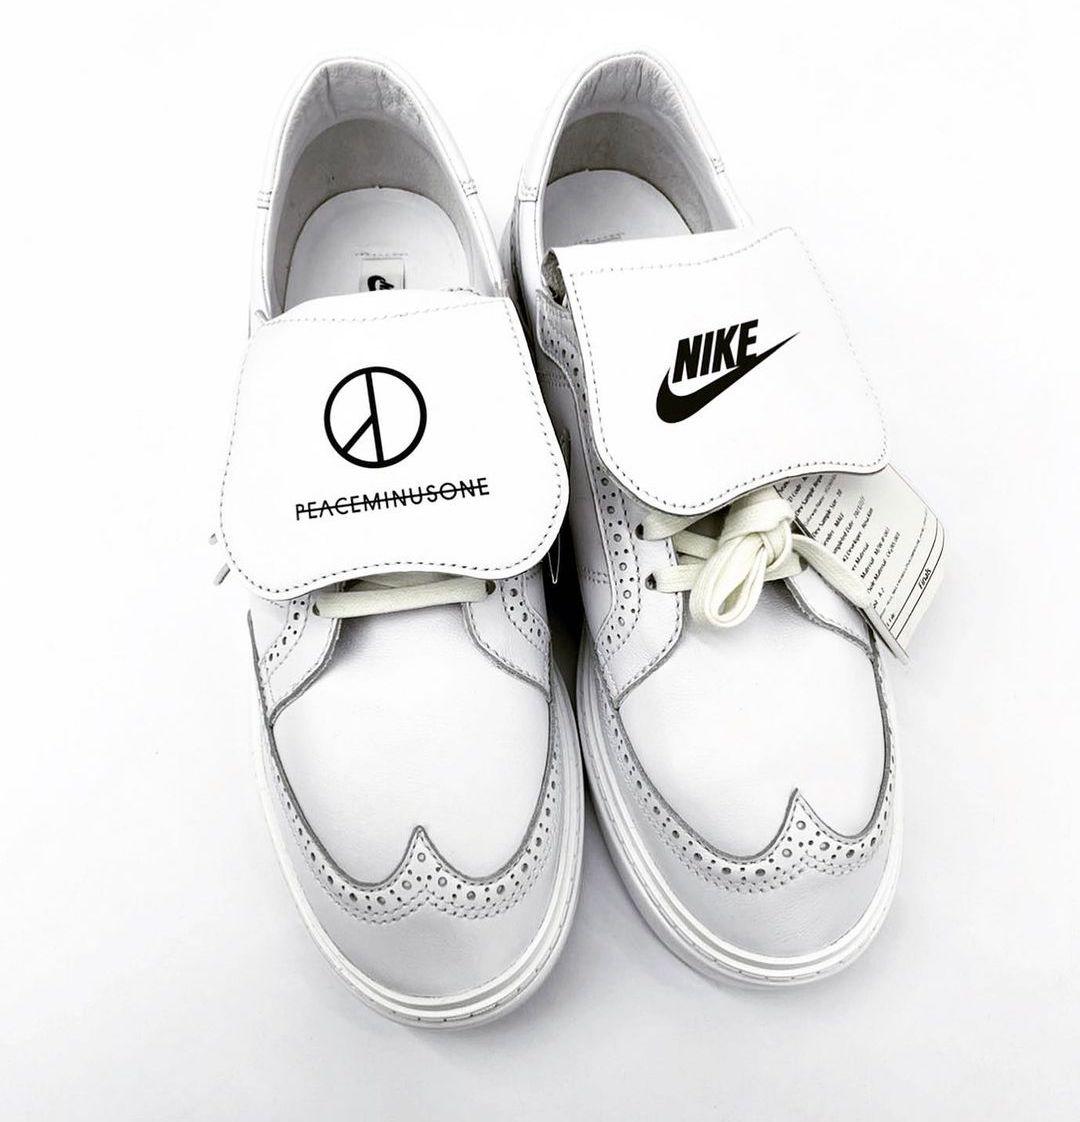 Kwondo 1,PEACEMINUSONE,权志龙,Nik  双鞋舌设计!权志龙 Nike 新鞋最新上脚!种草了!